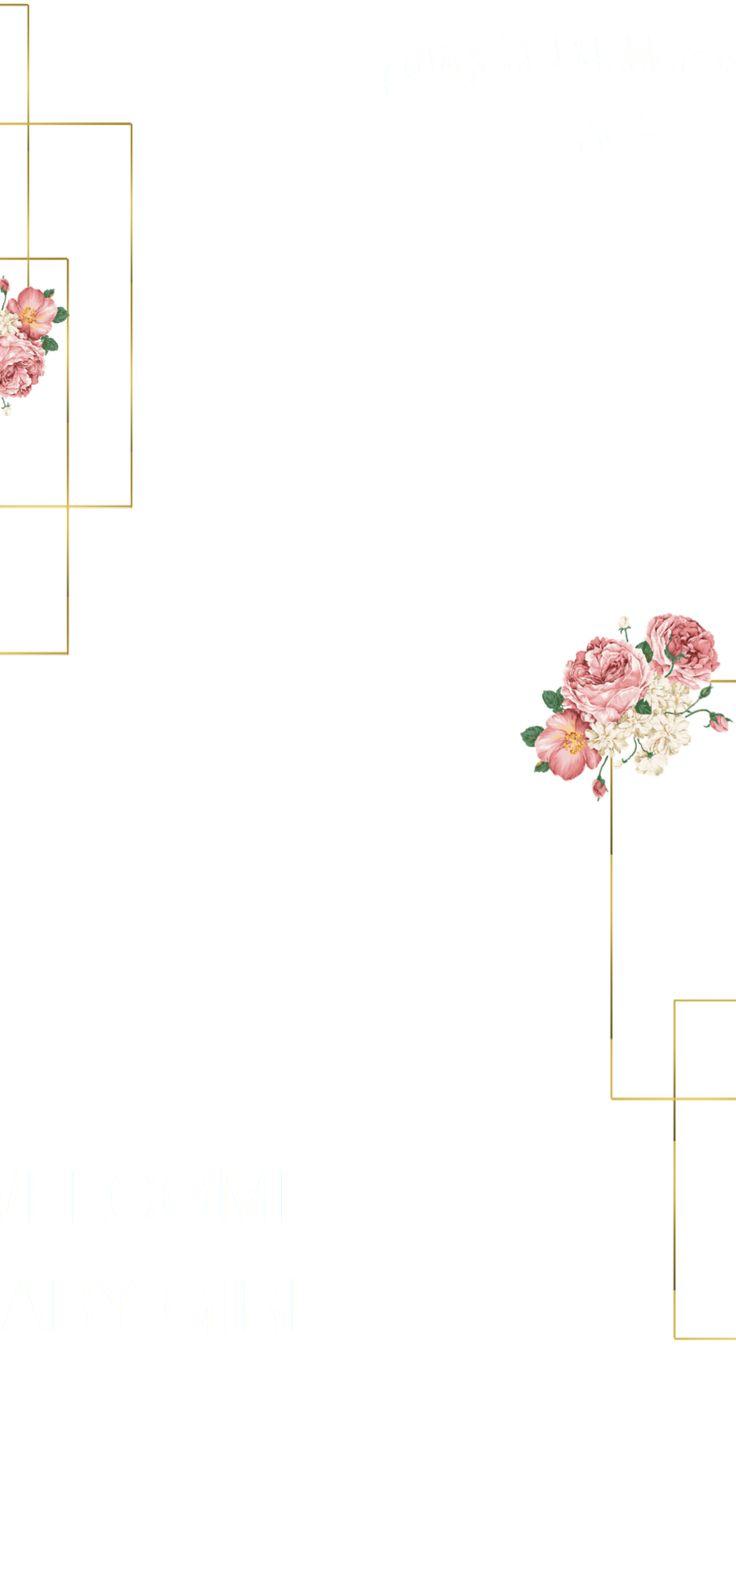 Pin By Muniraahh On فلتر معين Flower Background Wallpaper Wedding Background Wallpaper Phone Wallpaper Design